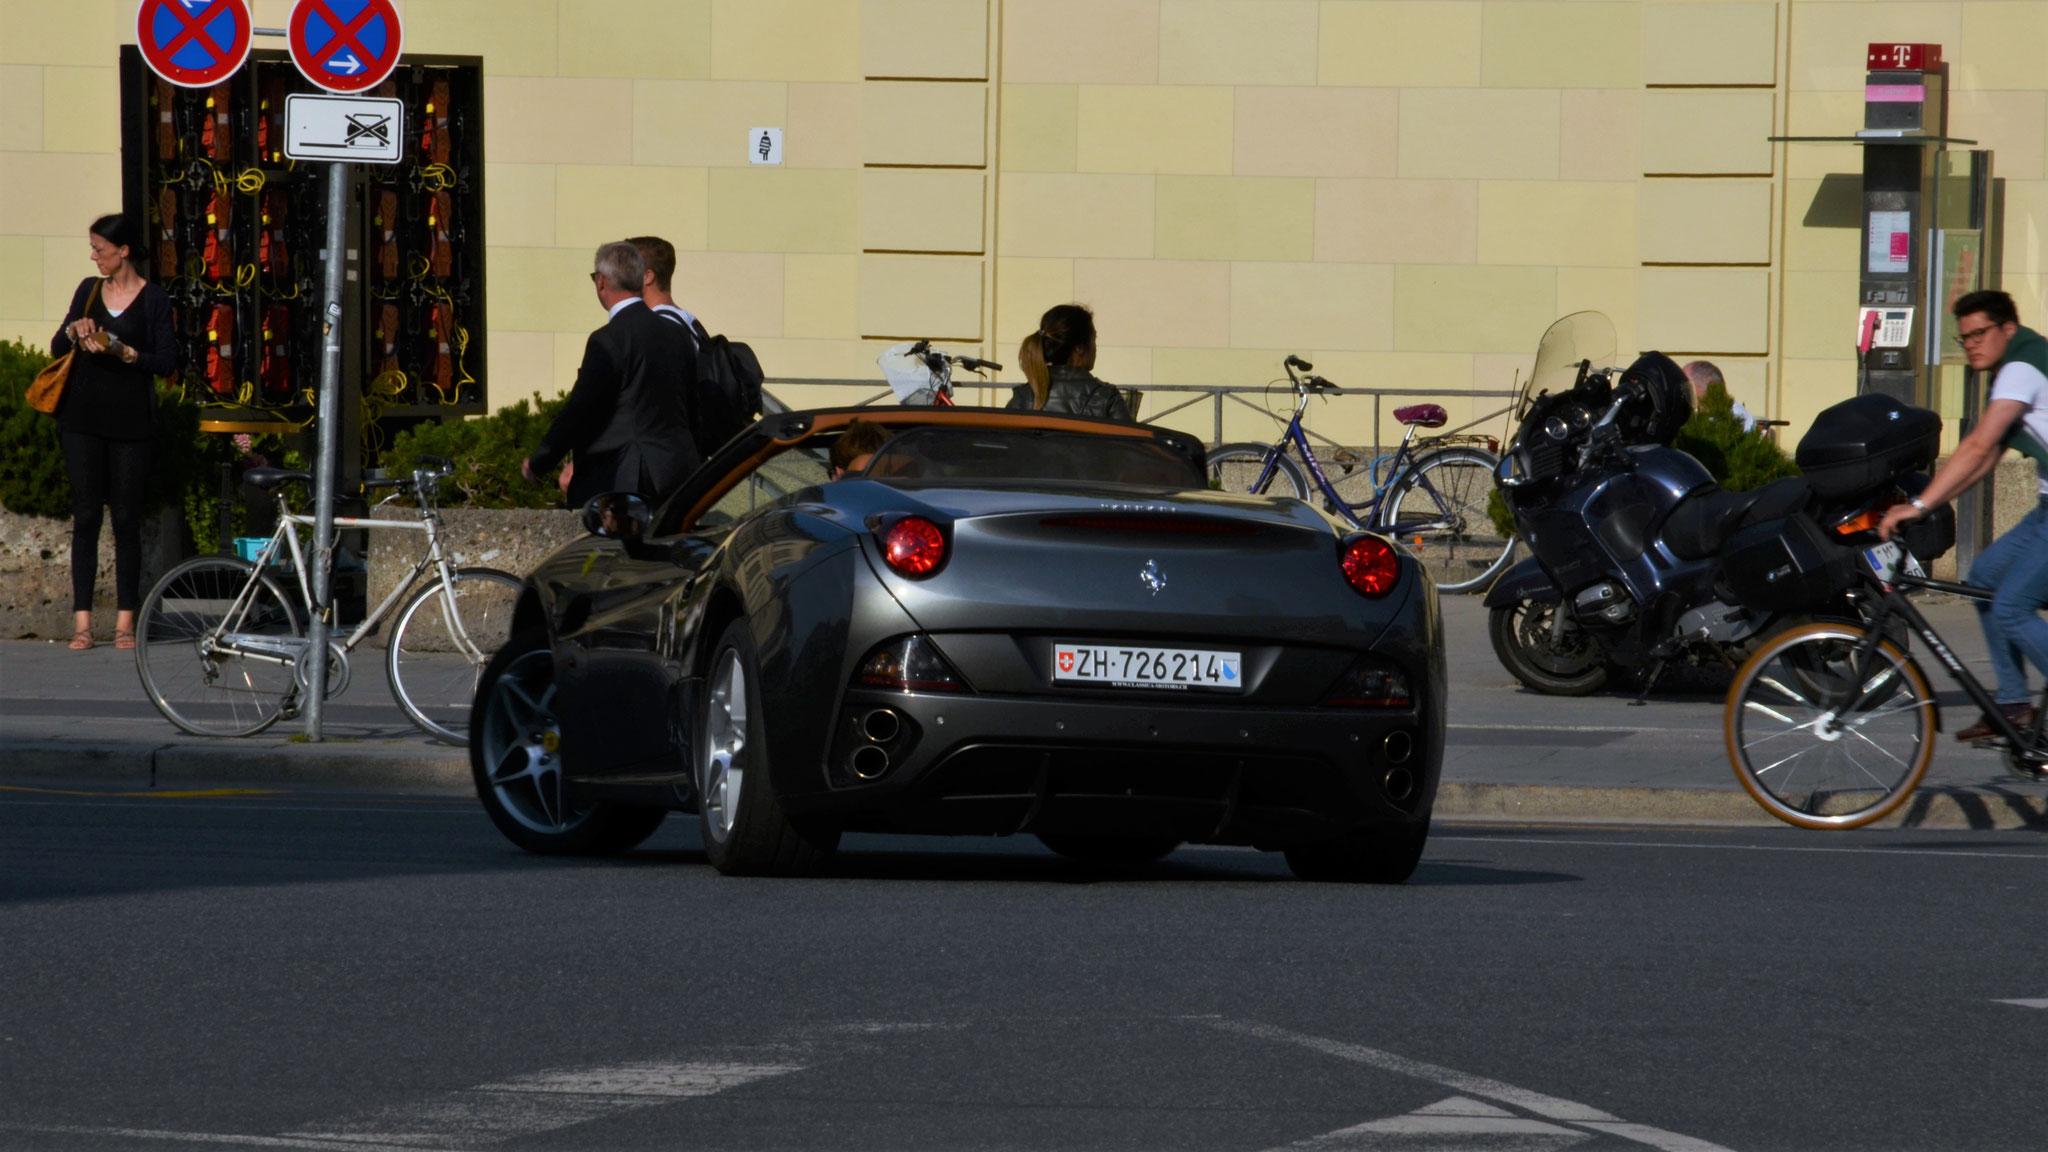 Ferrari California - ZH-726214 (CH)